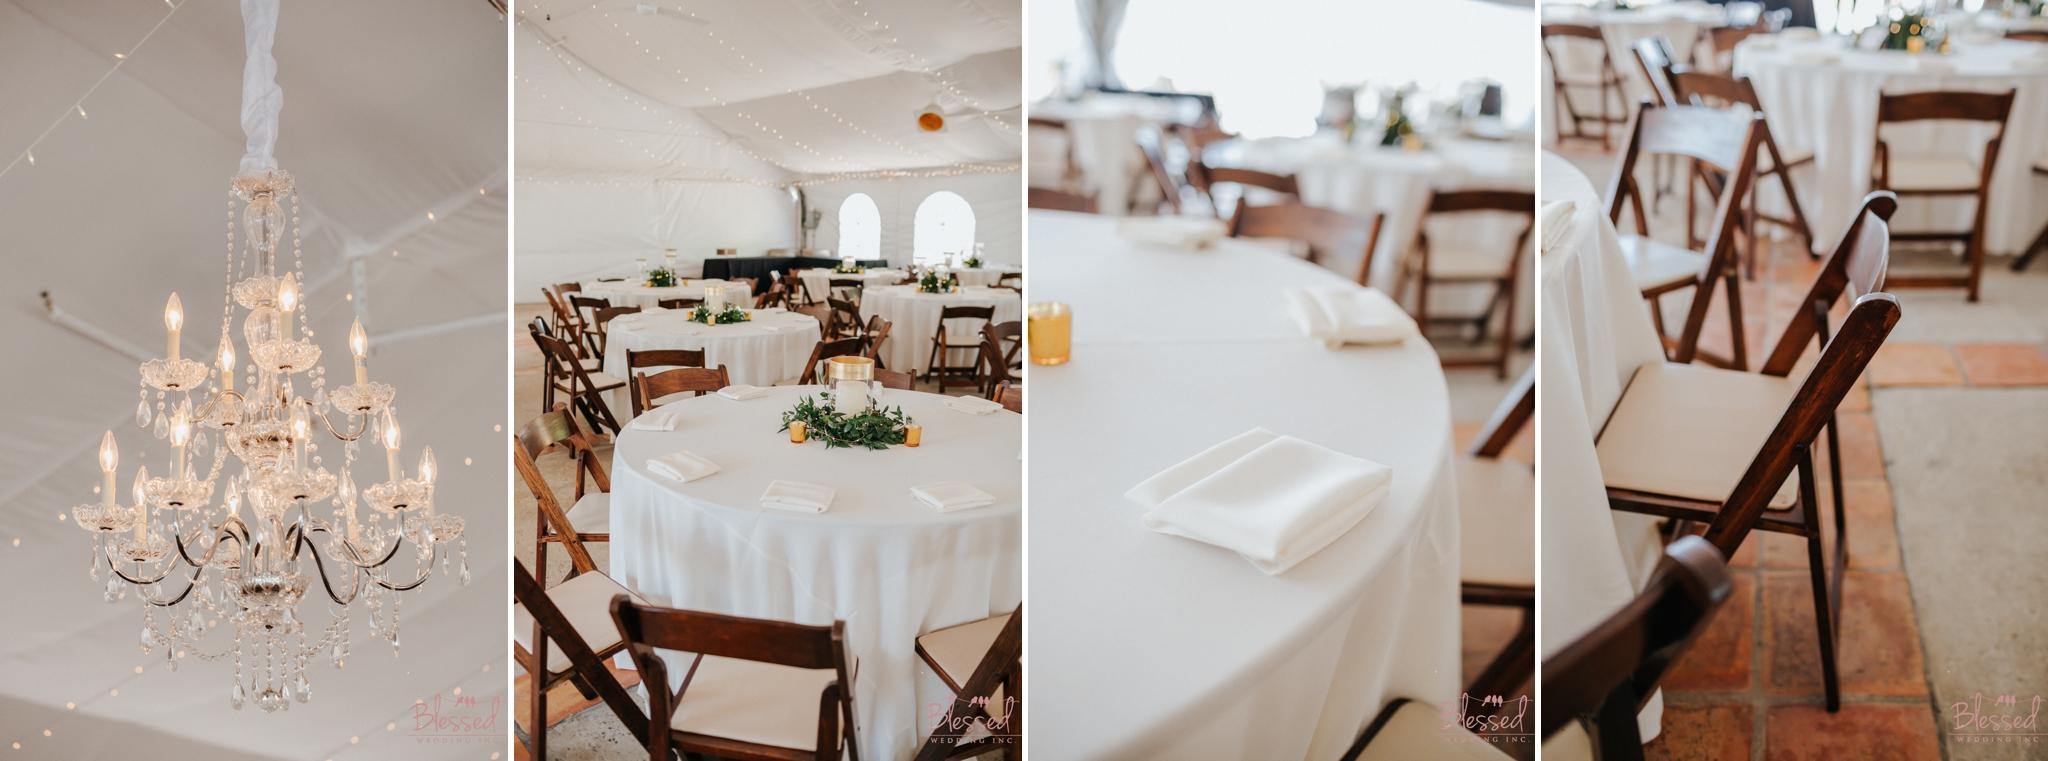 Orfila Vinery Wedding by Blessed Wedding Photography 35.jpg